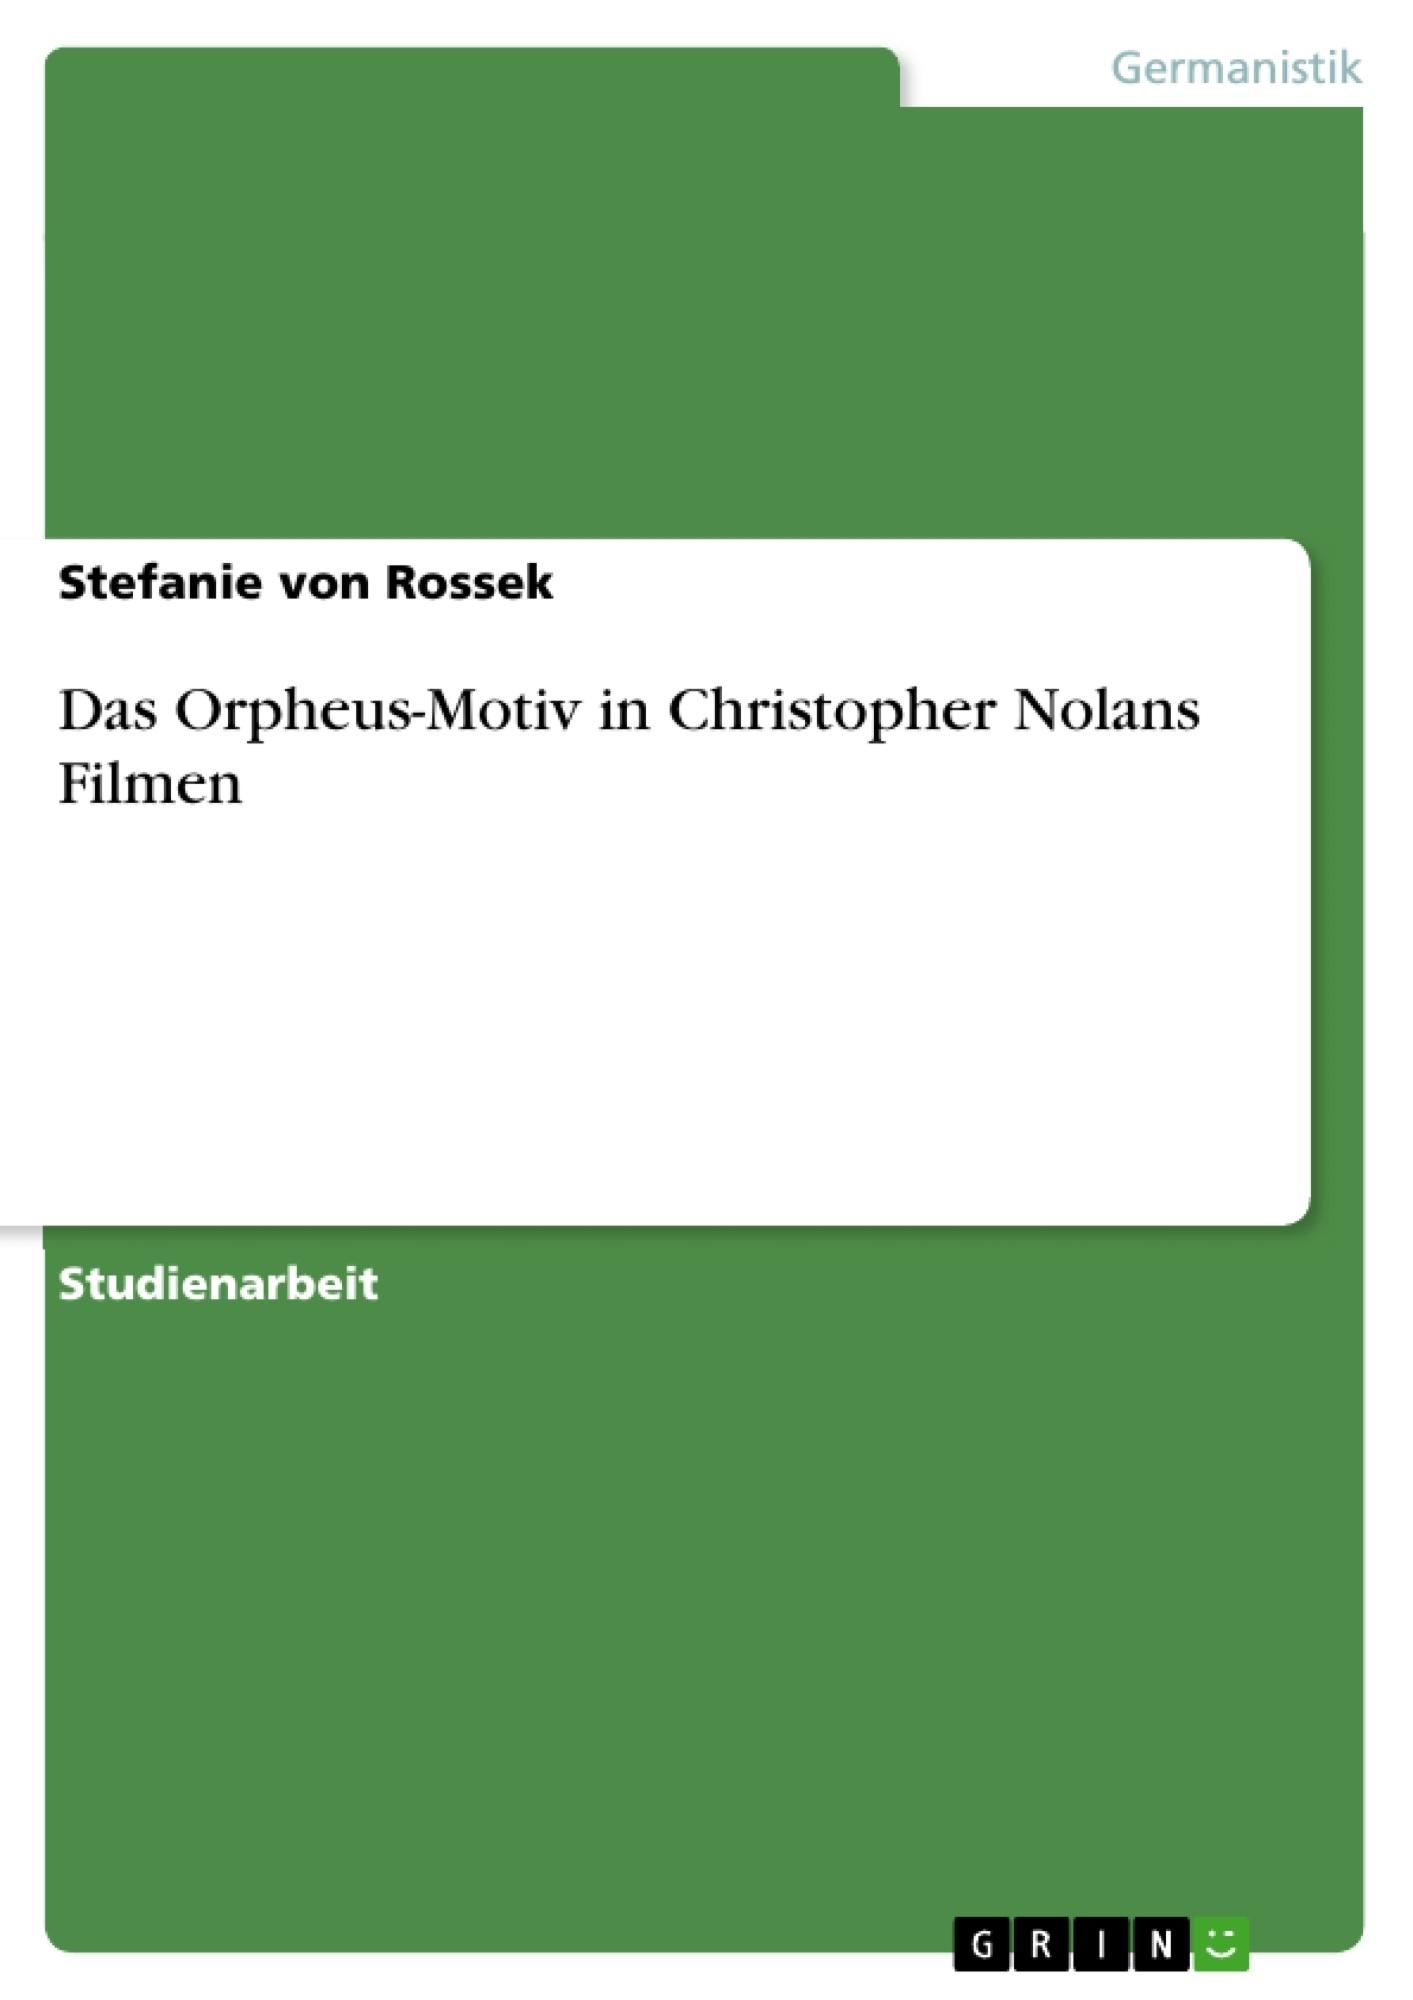 Titel: Das Orpheus-Motiv in Christopher Nolans Filmen